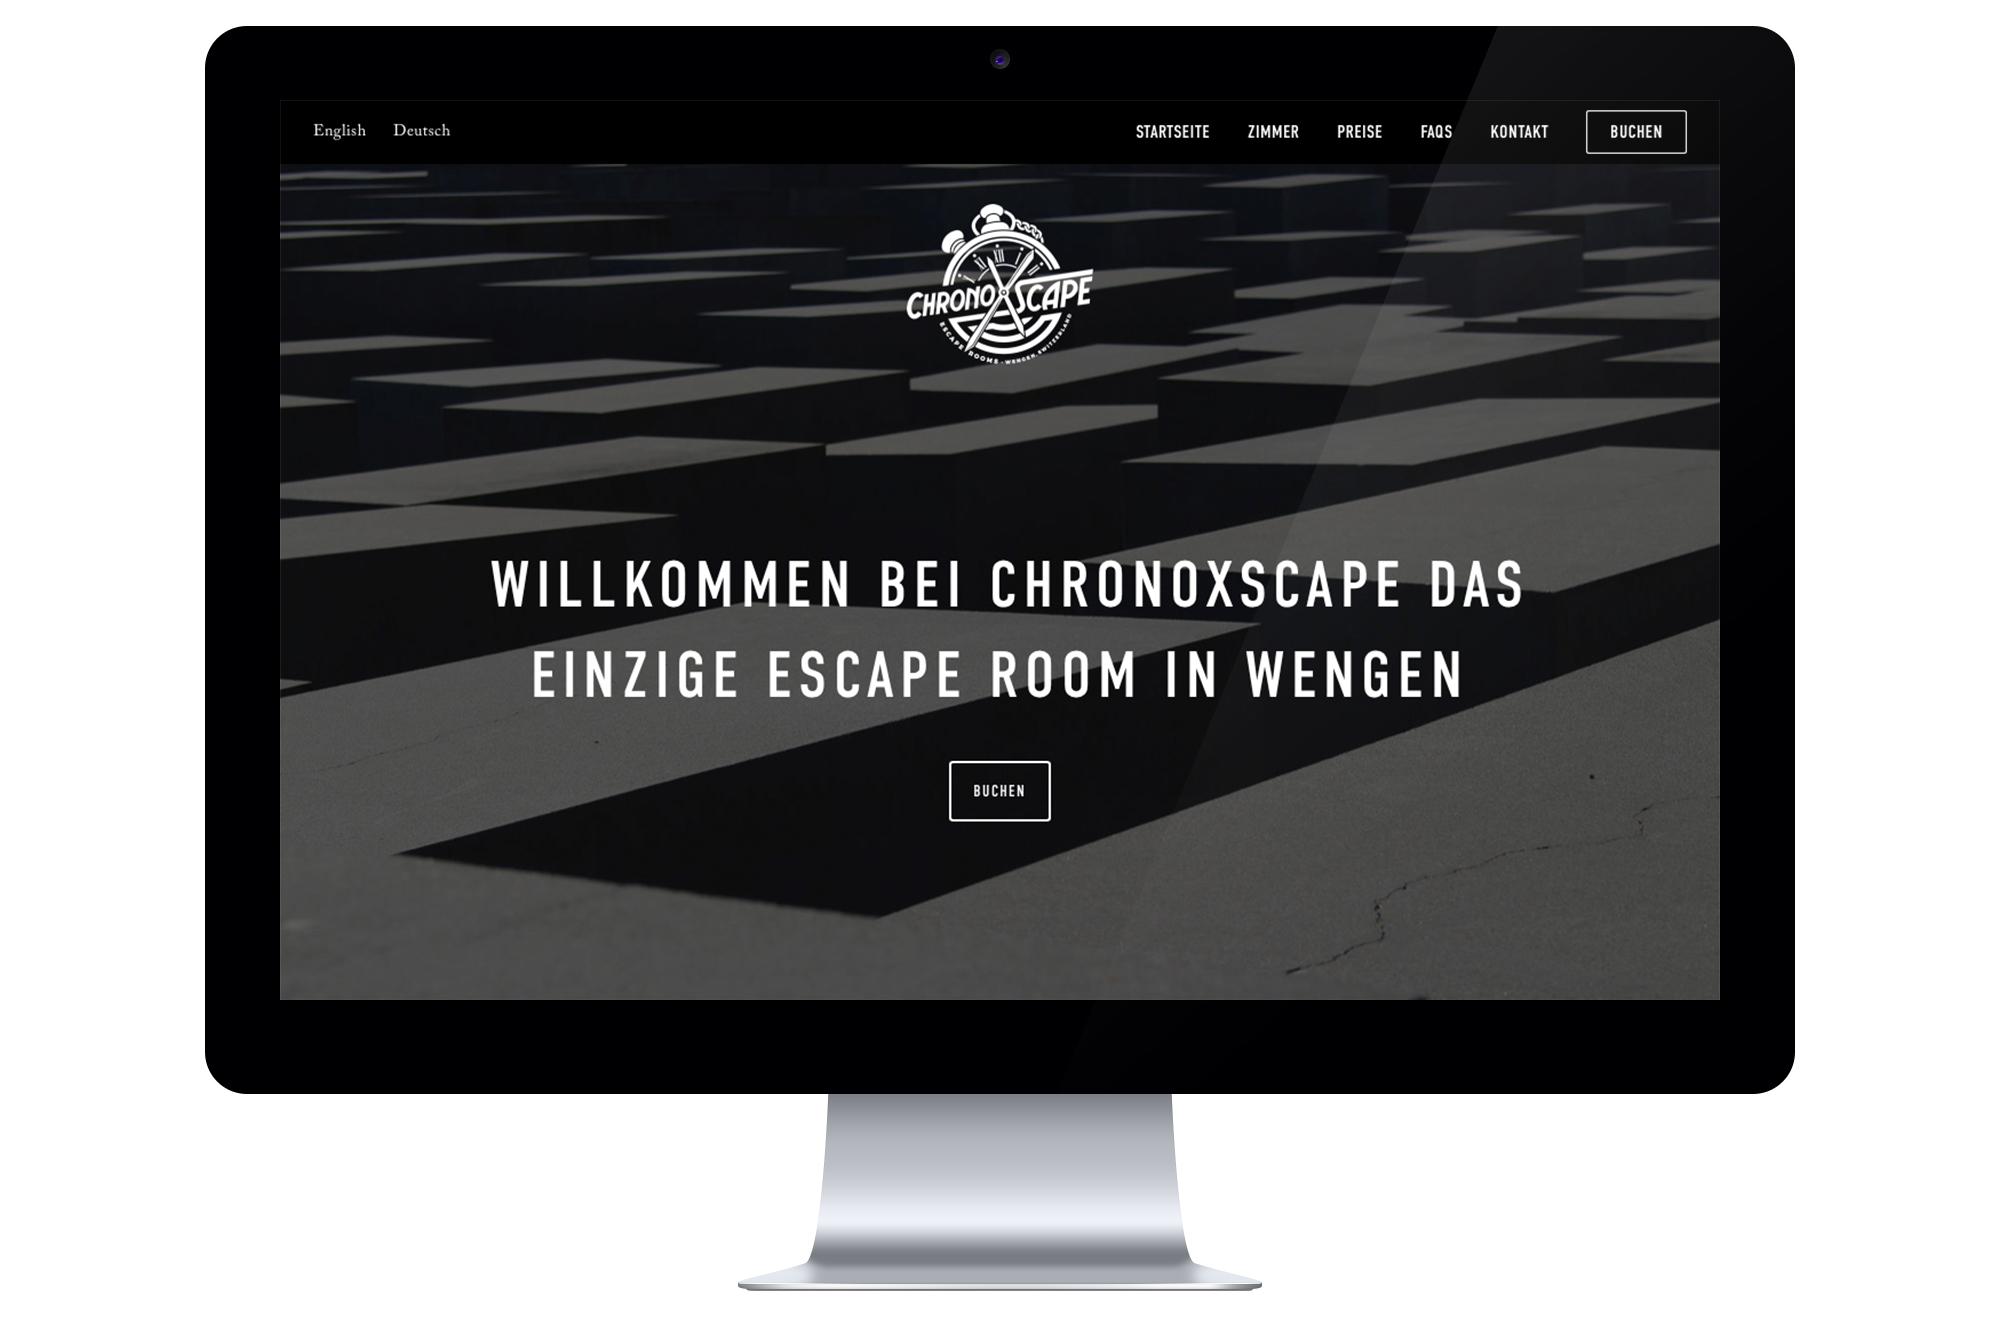 Chronoxscape_Mac_Monitor2.jpg